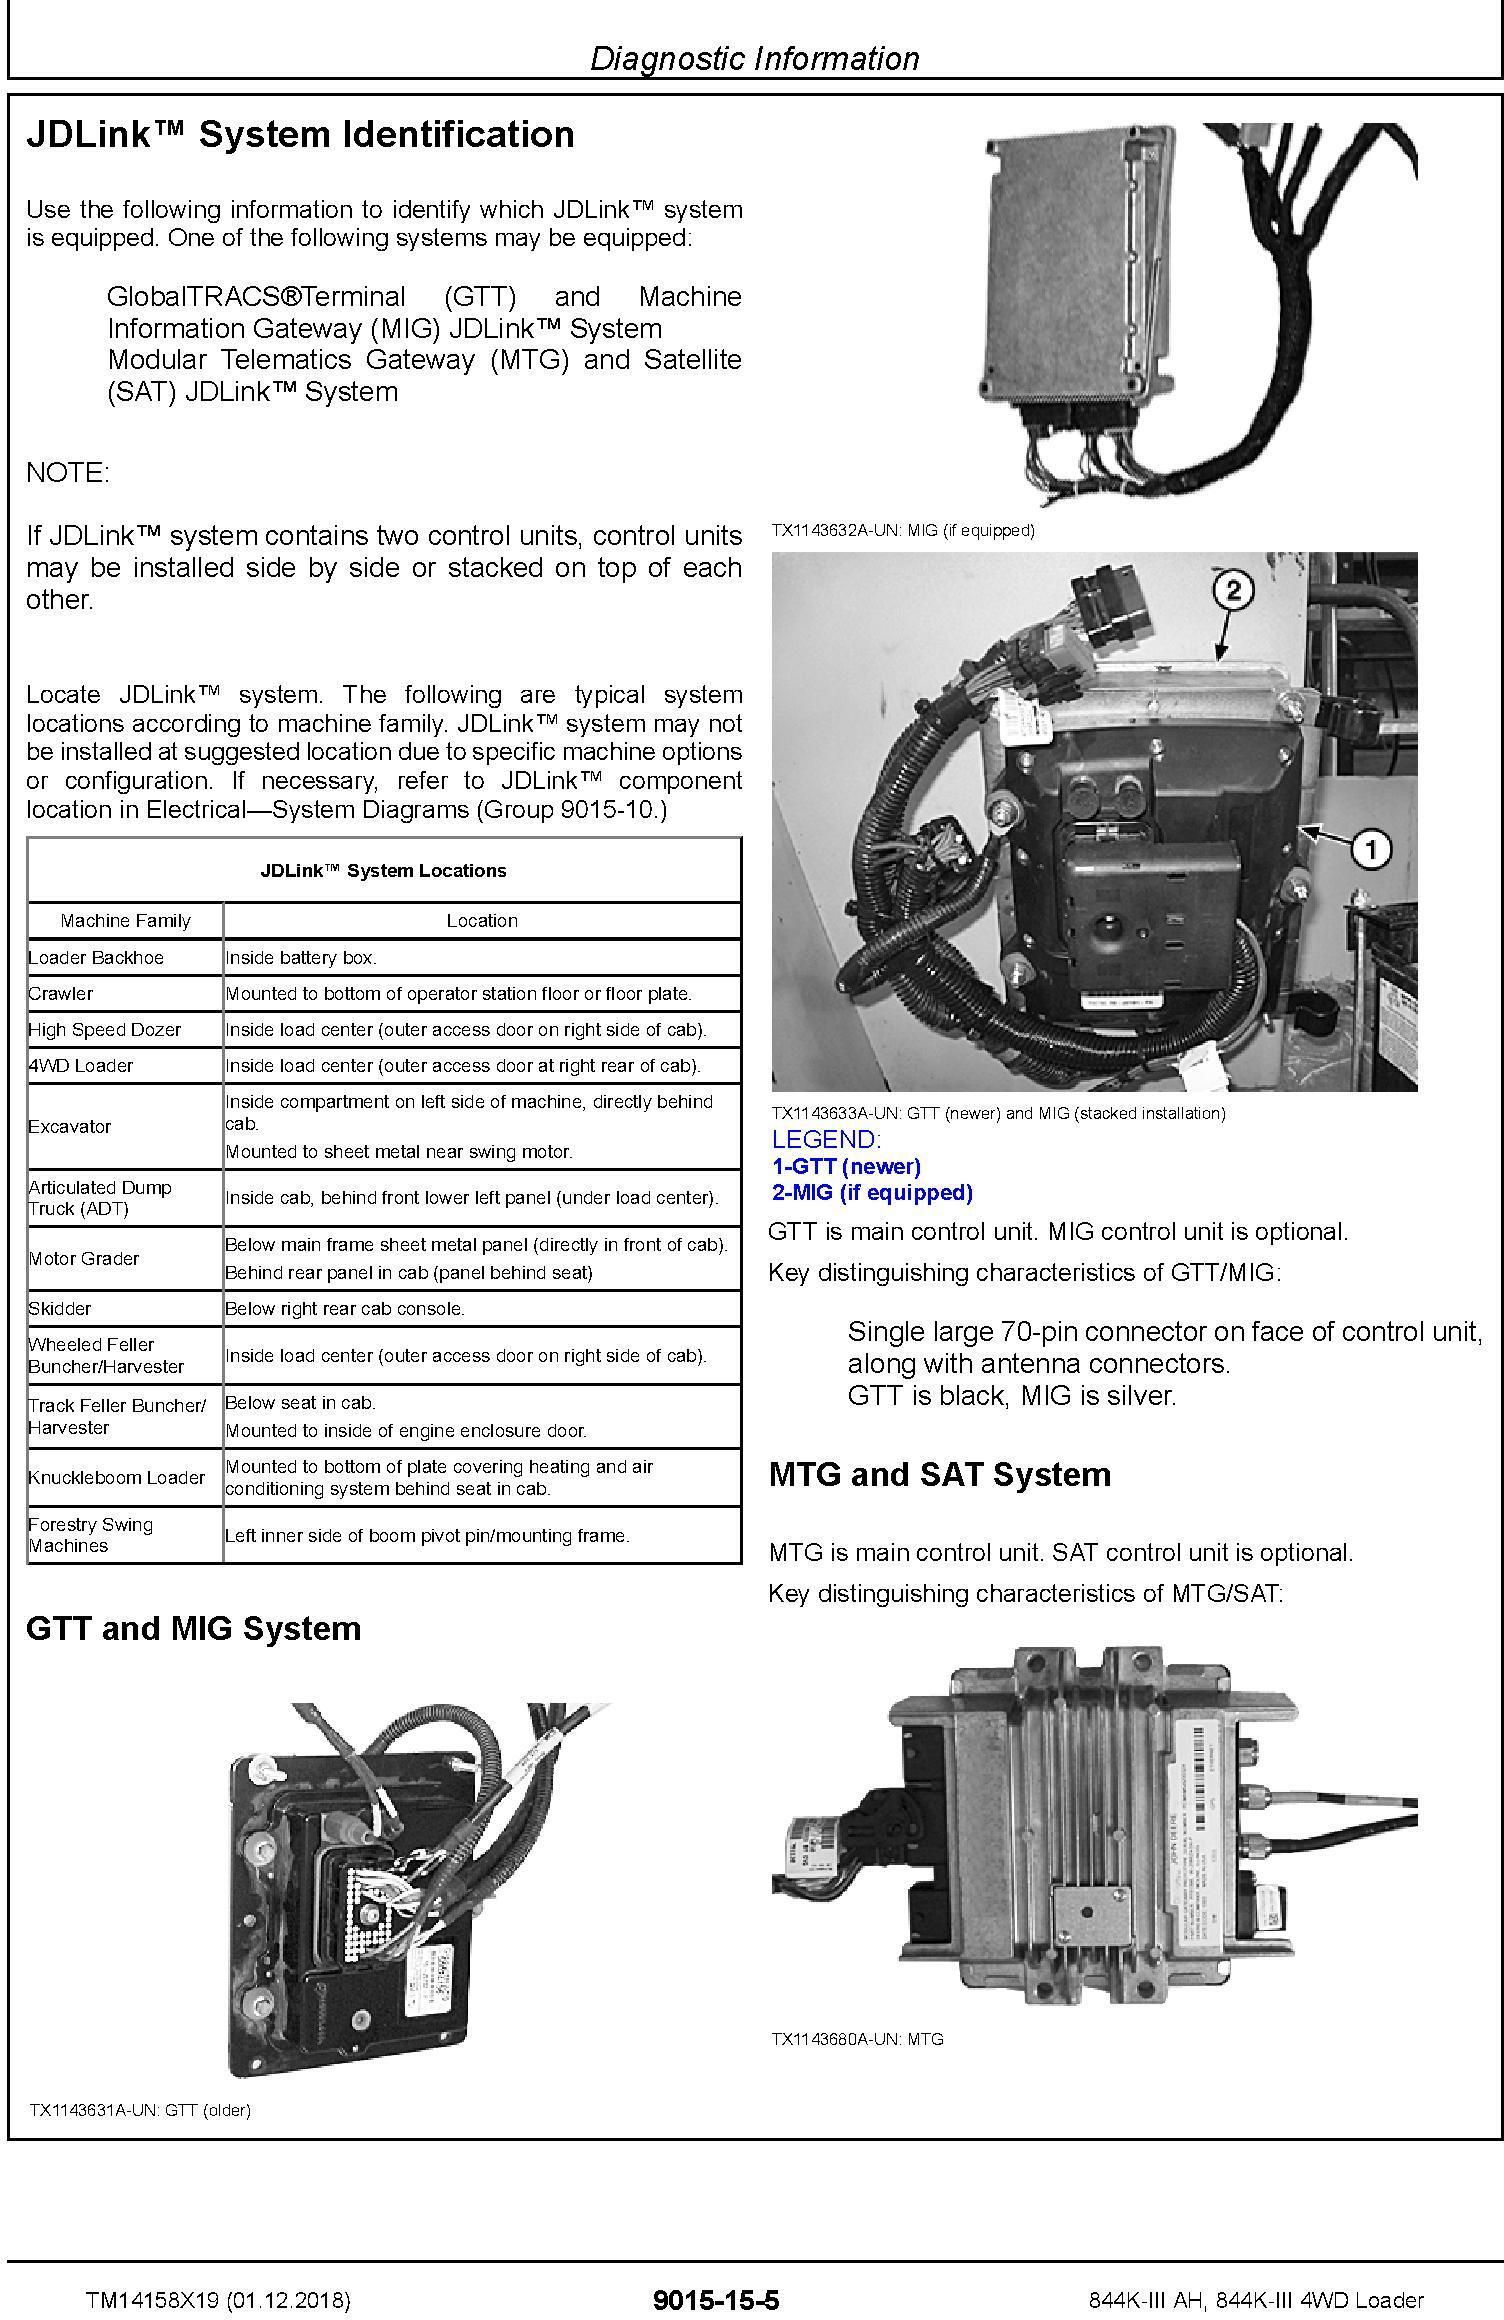 John Deere 844K-III AH, 844K-III (SN. F677782-) 4WD Loader Diagnostic Technical Manual (TM14158X19) - 1